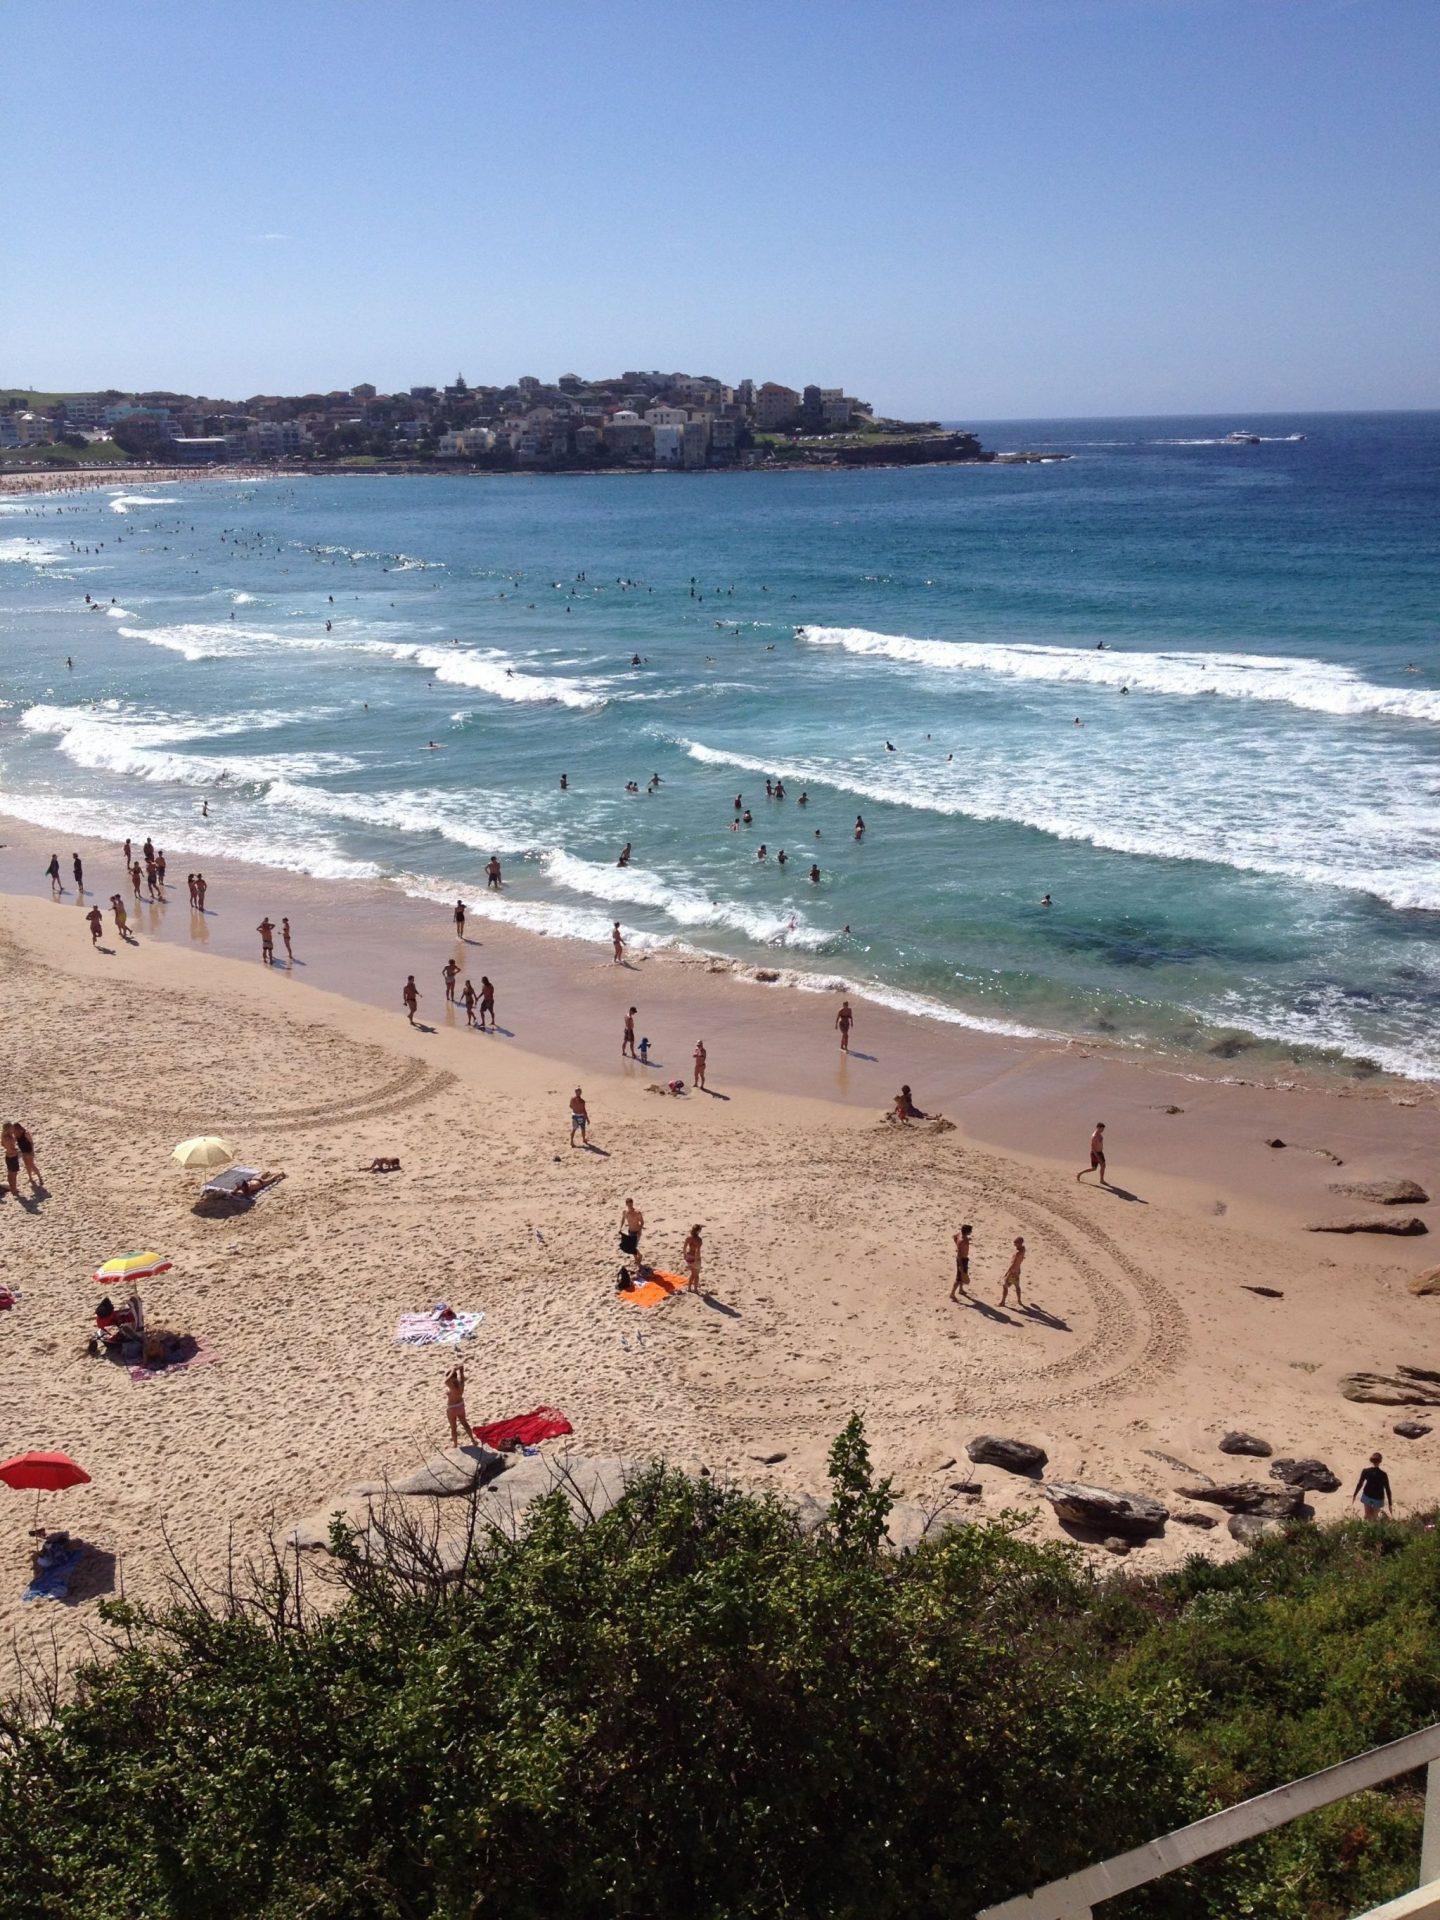 Bondi Beach, the beginning of the Bondi to Coogee Walk, Sydney